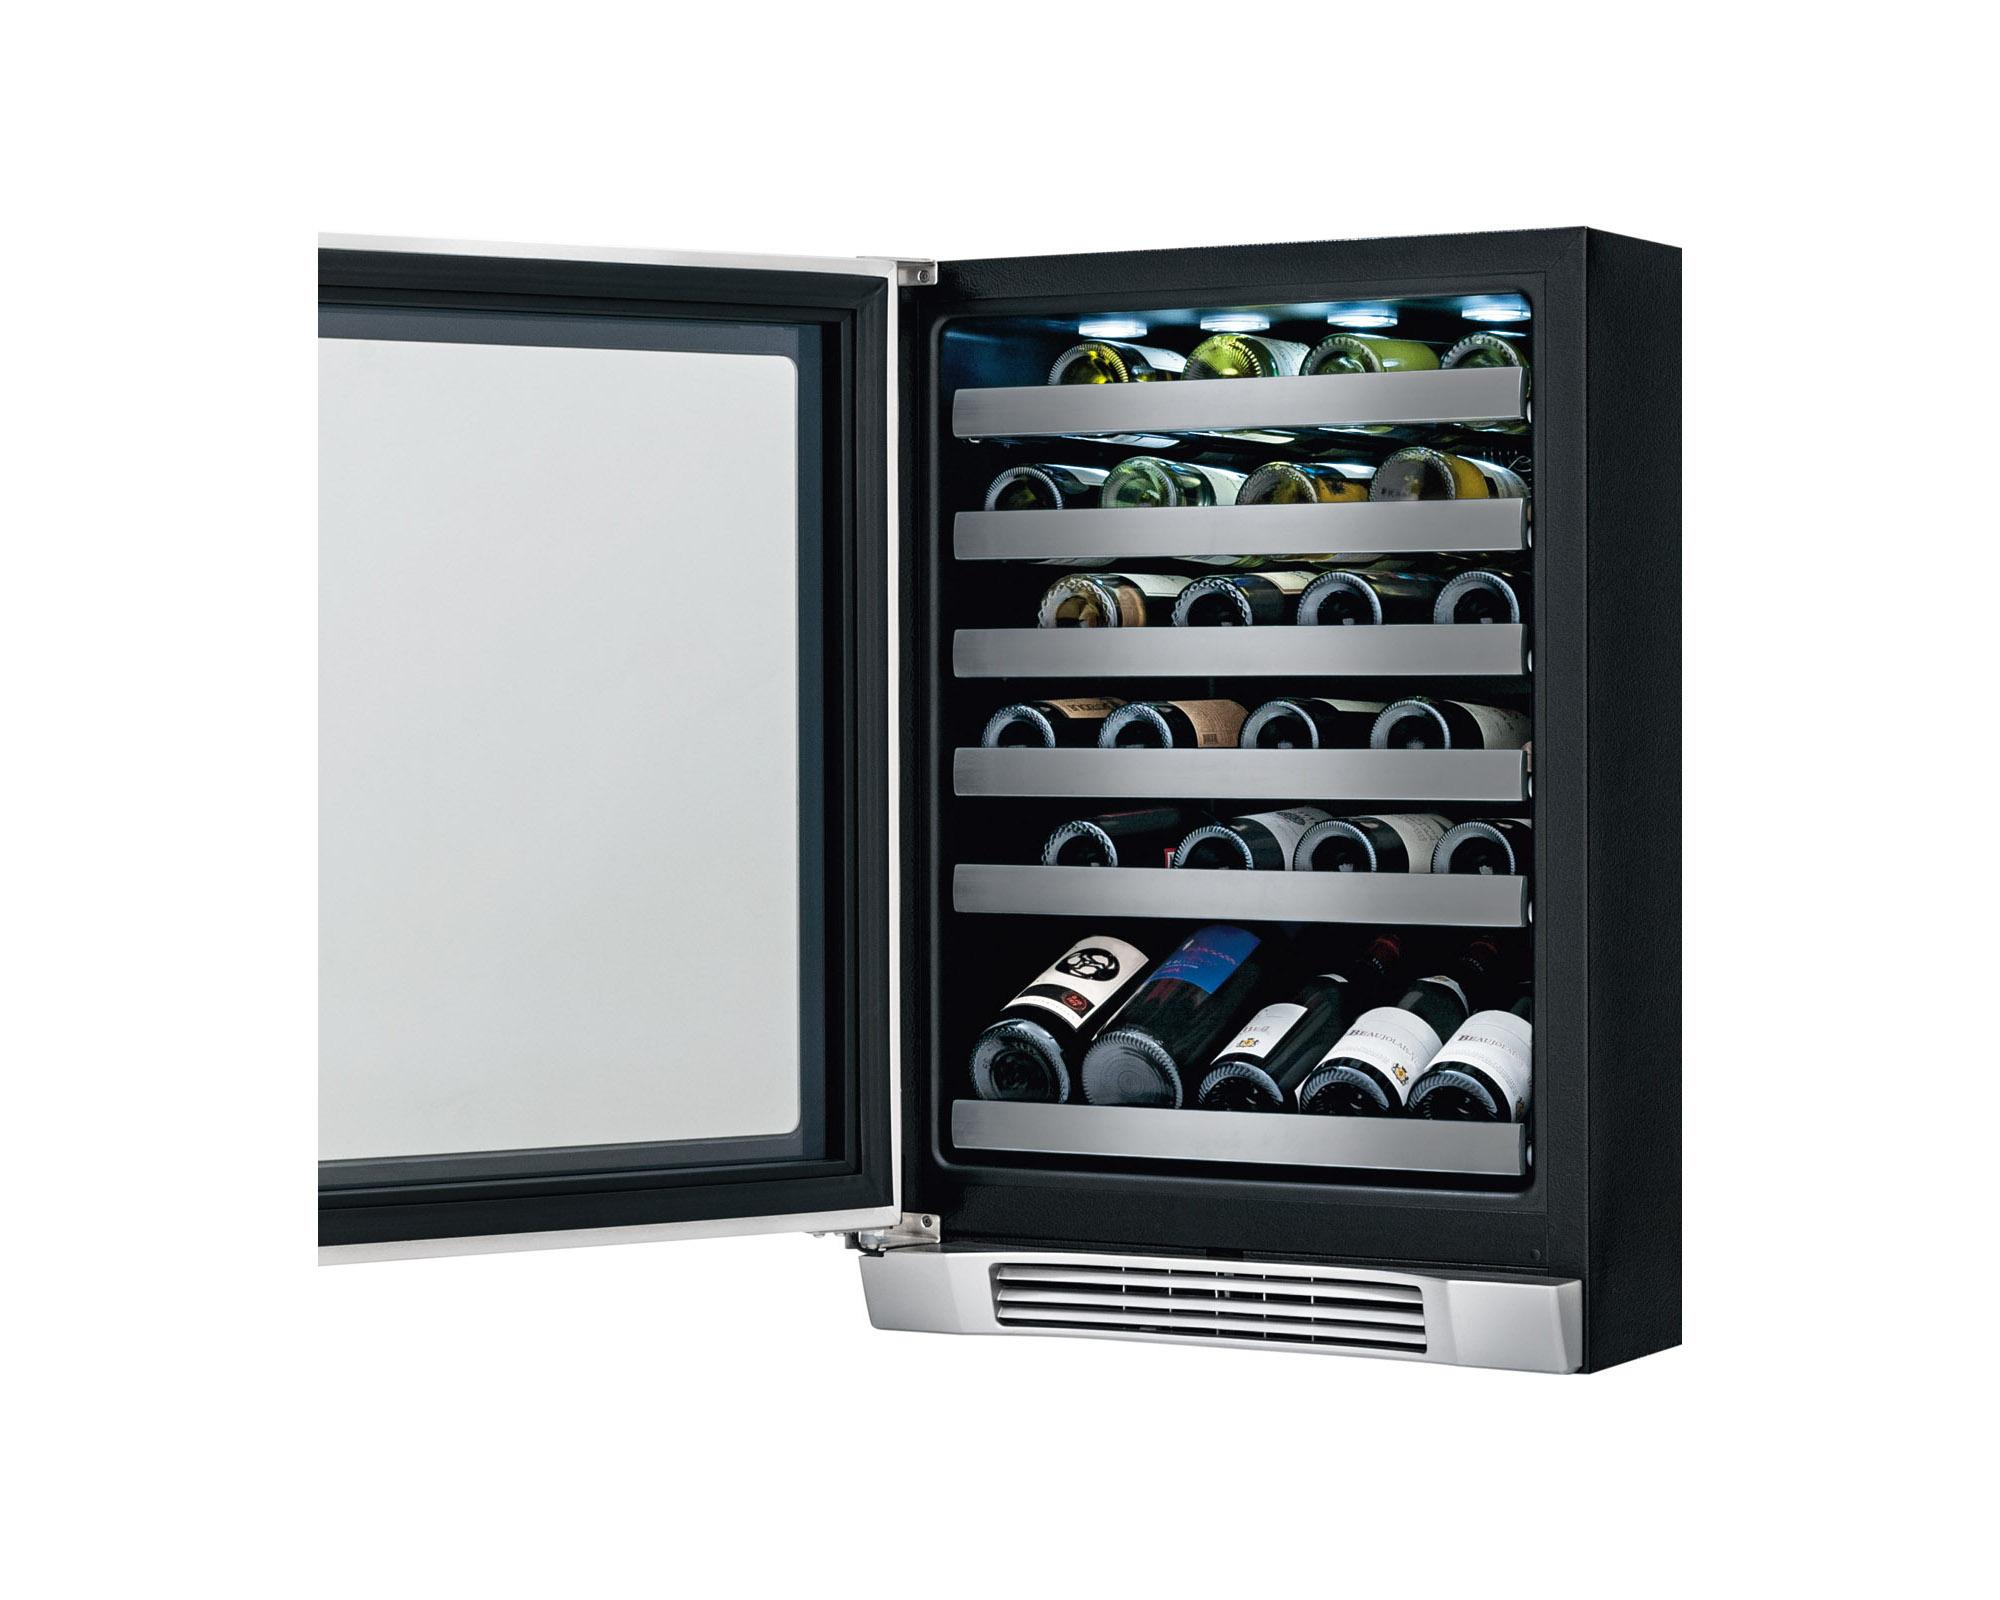 Electrolux EI24WL10QS 4.9 cu. ft. Left Hinge Wine Cooler - Stainless Steel